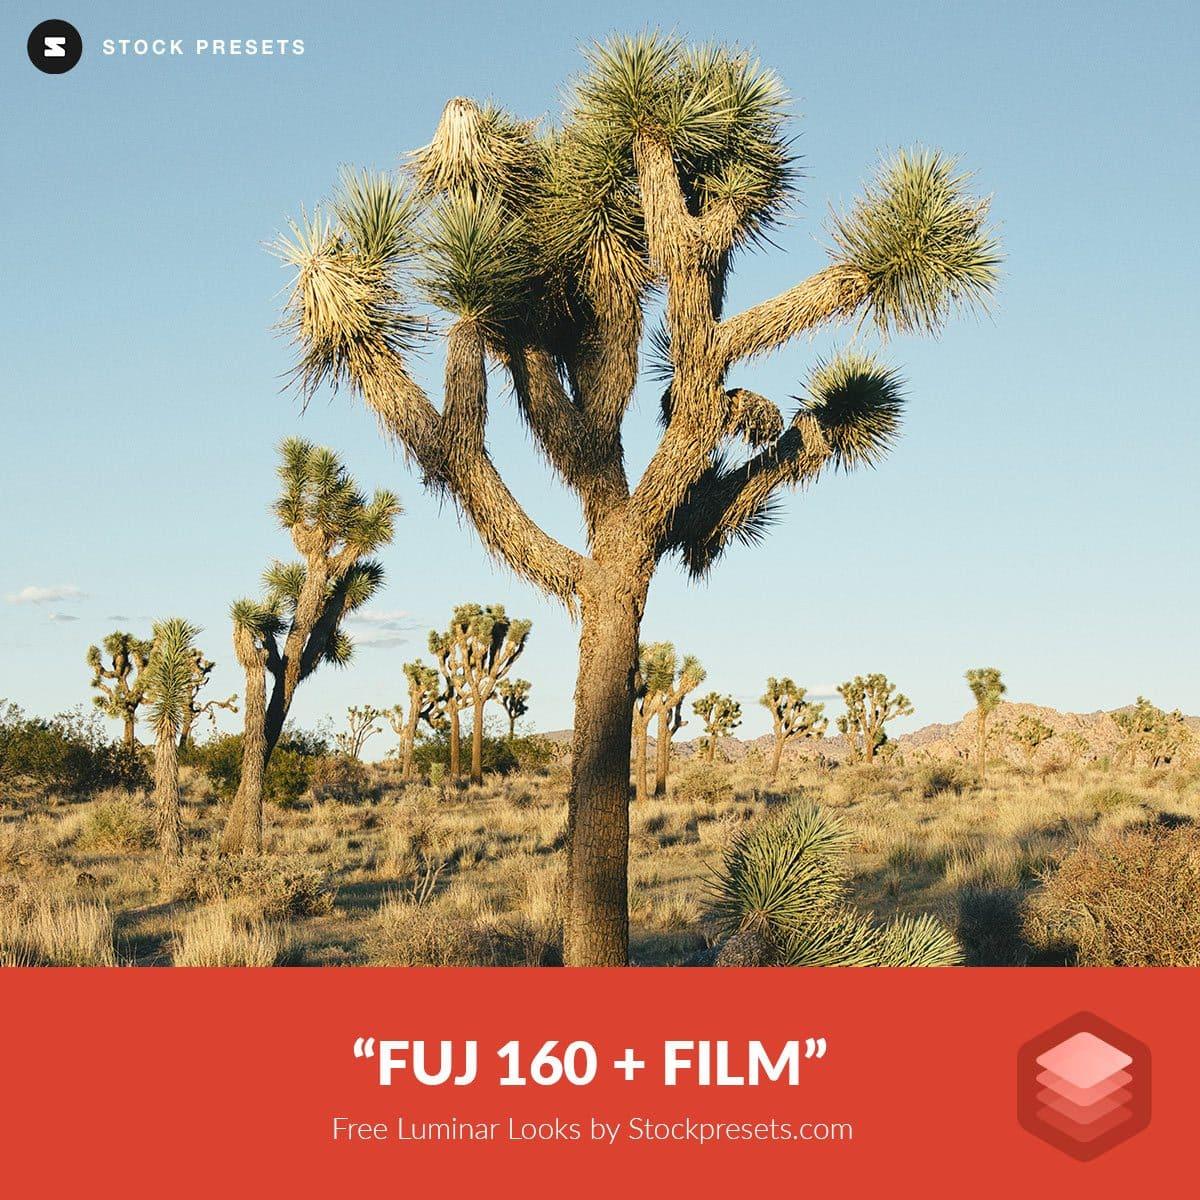 Free-Luminar-Look-FUJ-160-film-Preset-Stockpresets